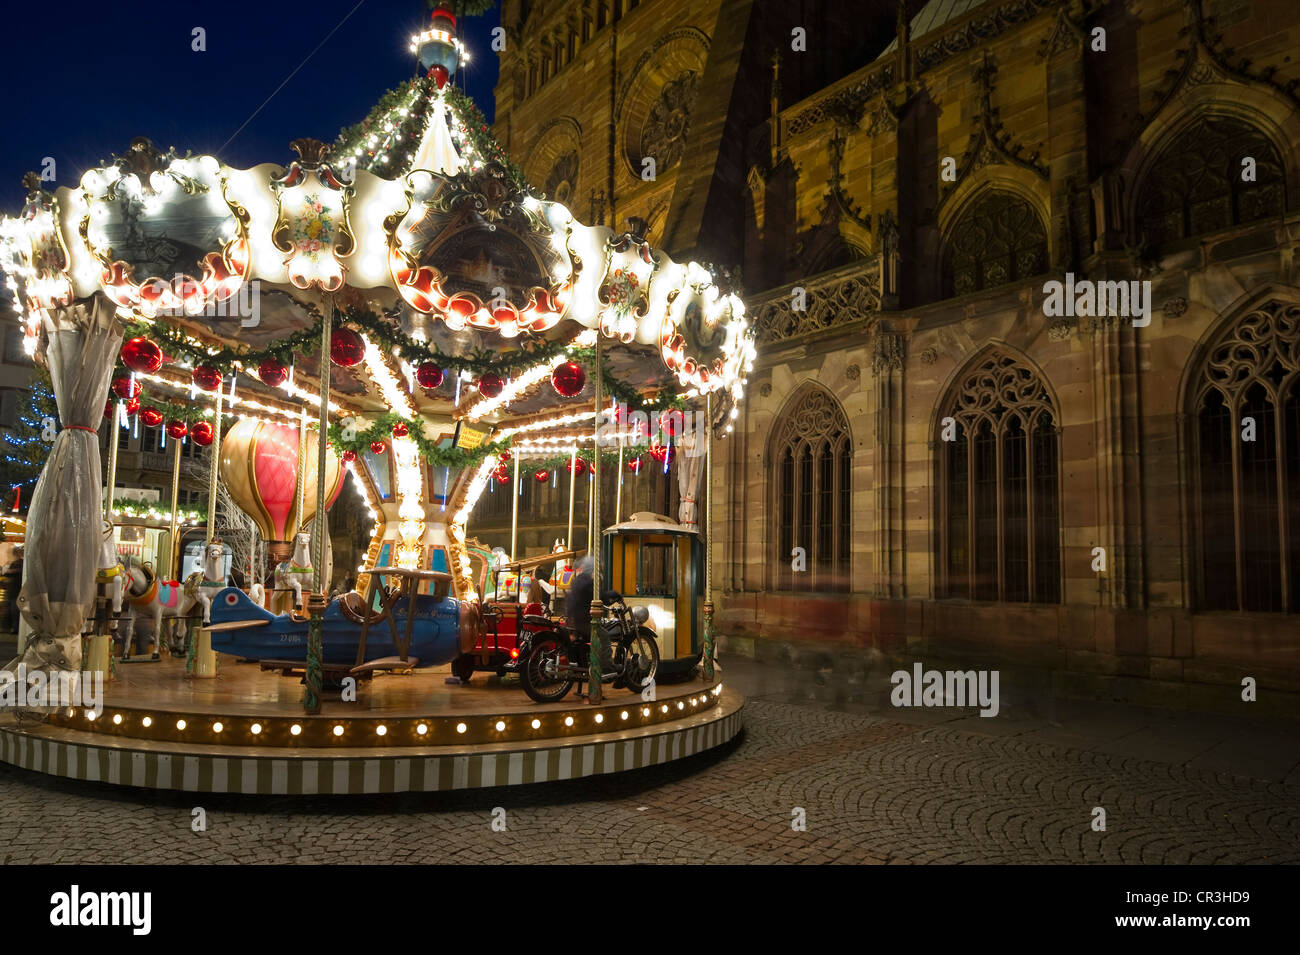 carousel christmas market in strasbourg alsace france europe stock image - Christmas Carousel Decoration